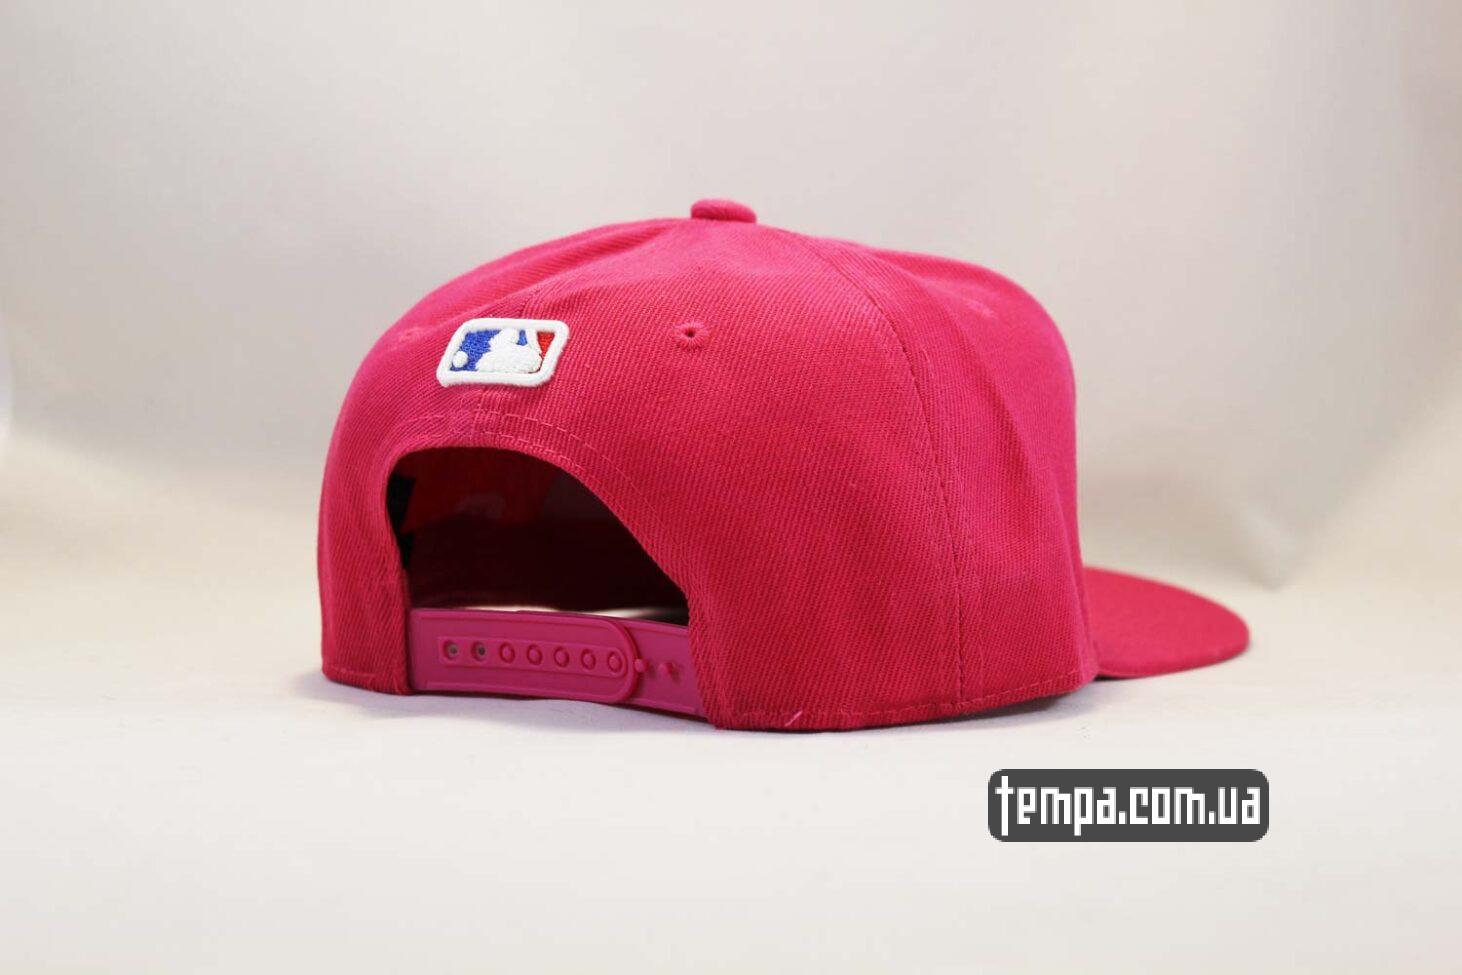 newEra кепка snapback NY Yankees New York Pink Розовая купить Украина